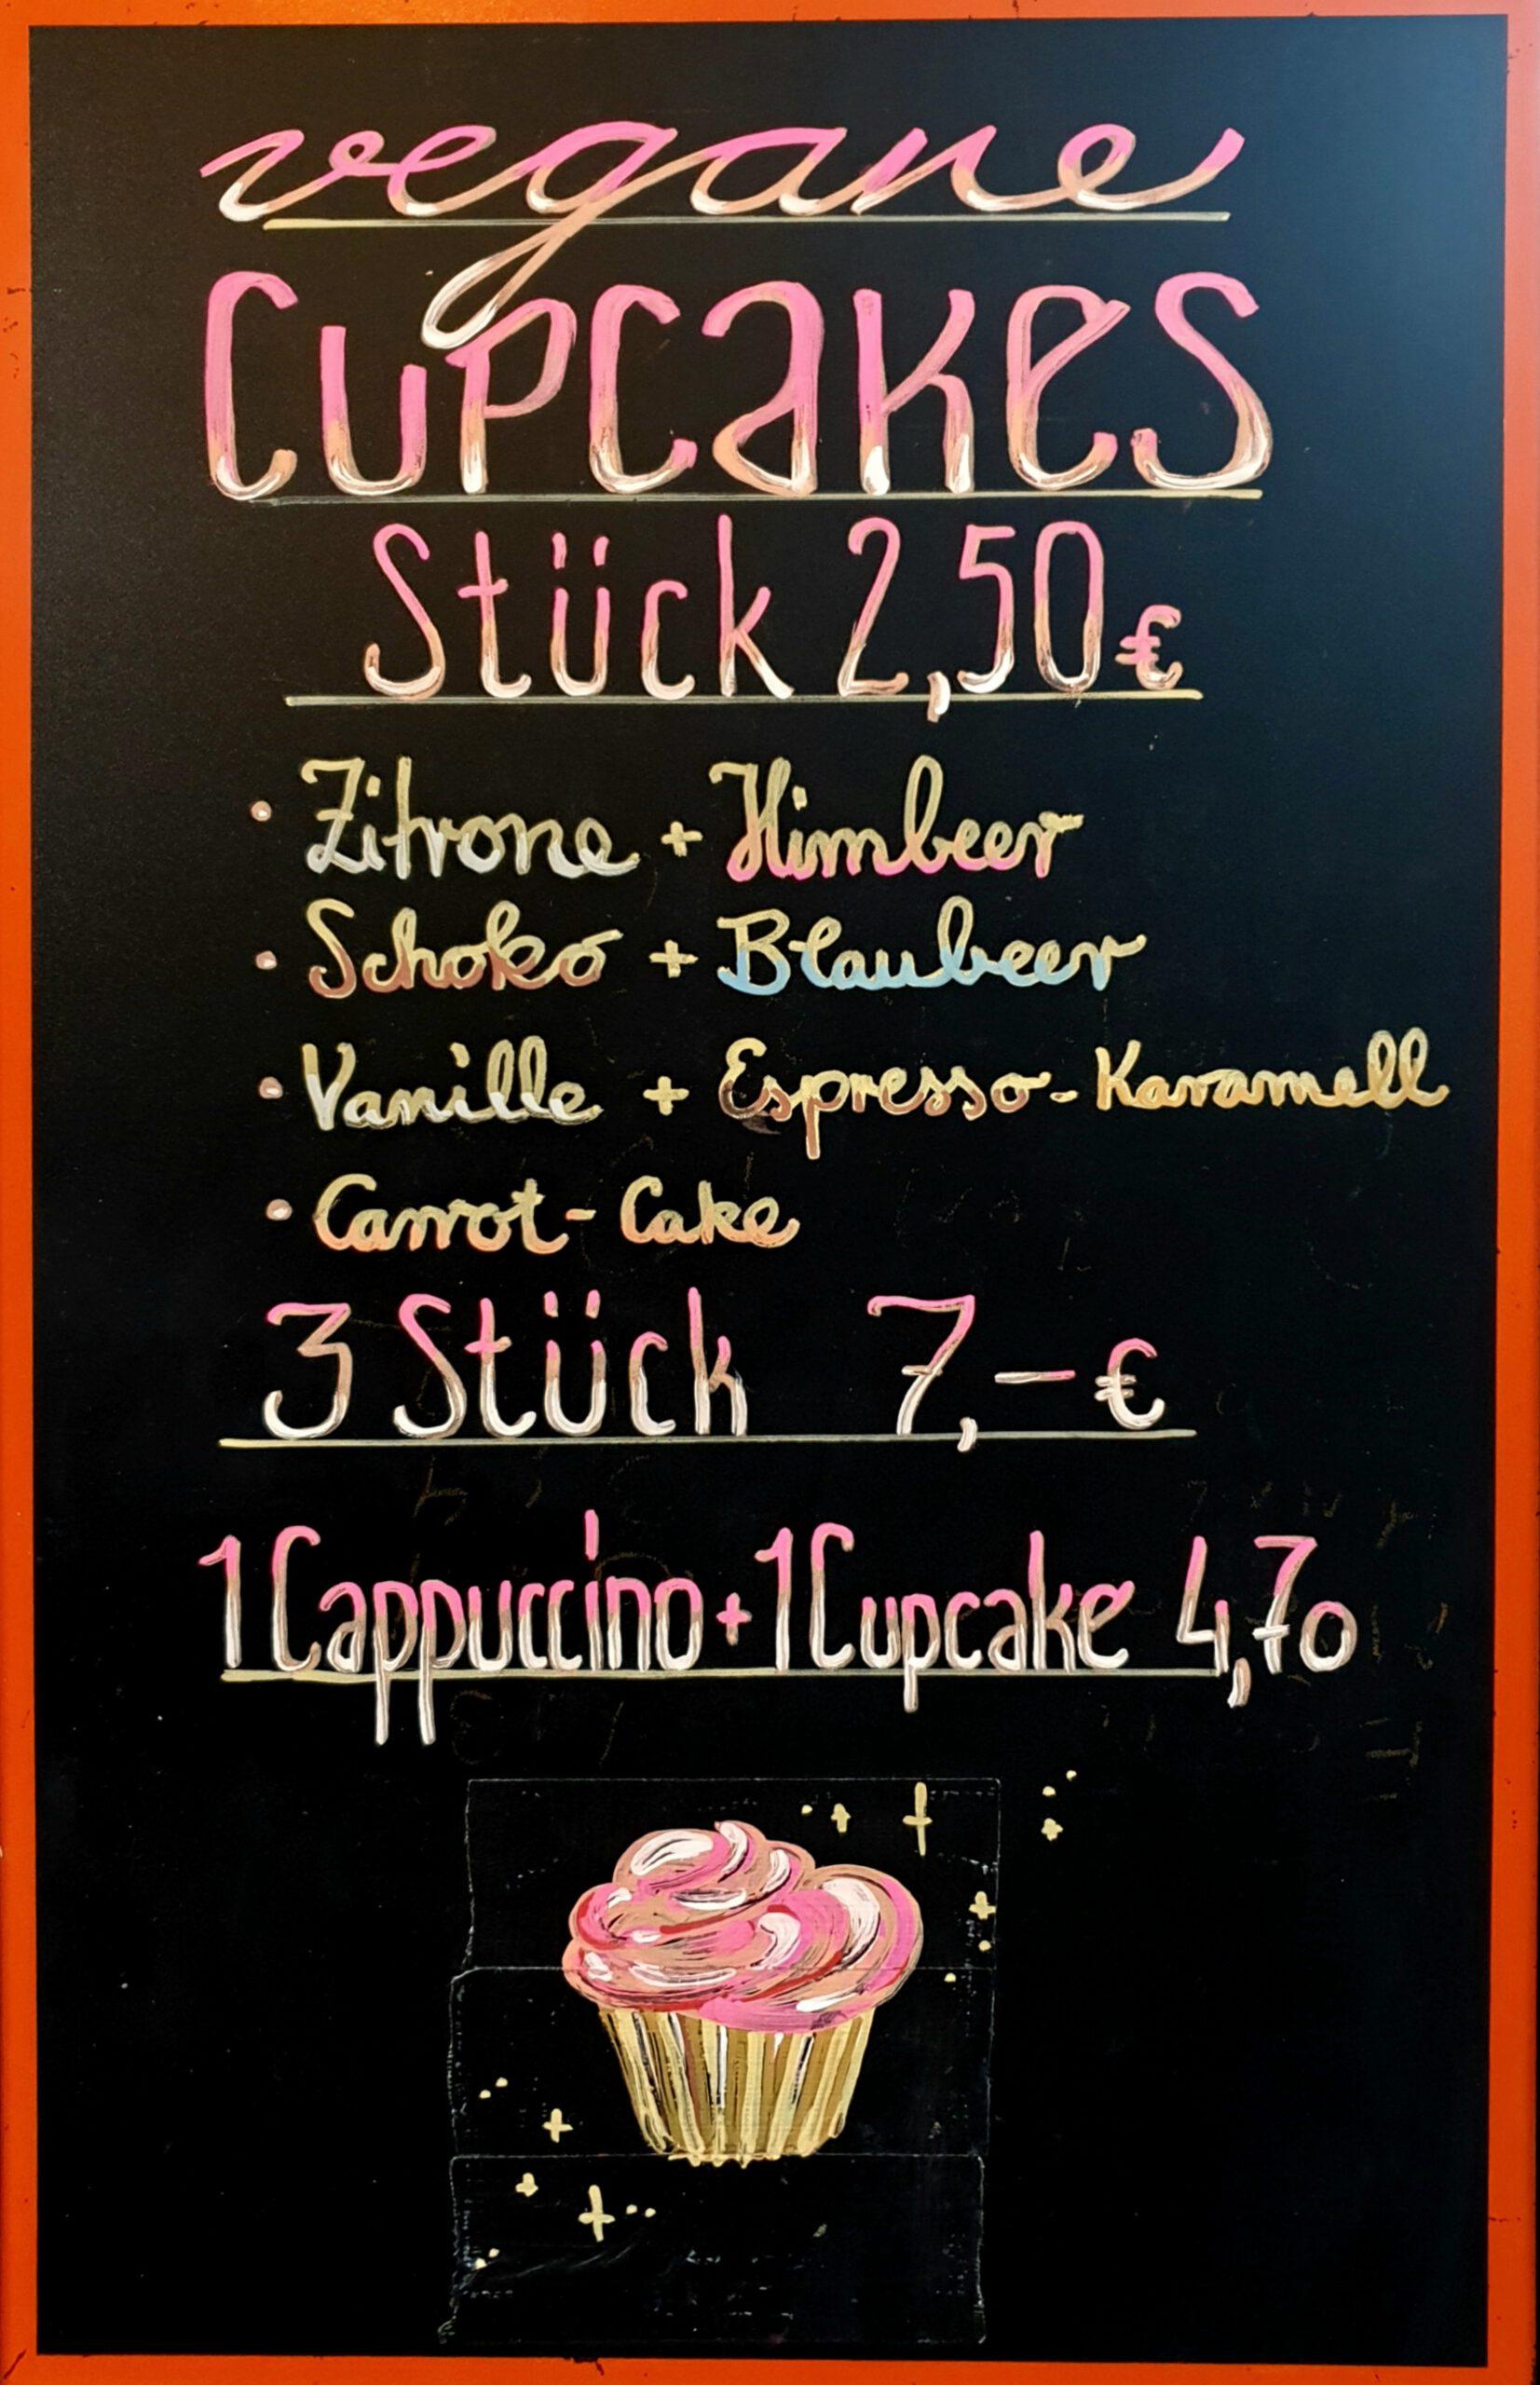 Feldstern Hamburg Veganer Cupcake Preis 2.50 Euro Stück. 3 Stück 7 Euro.